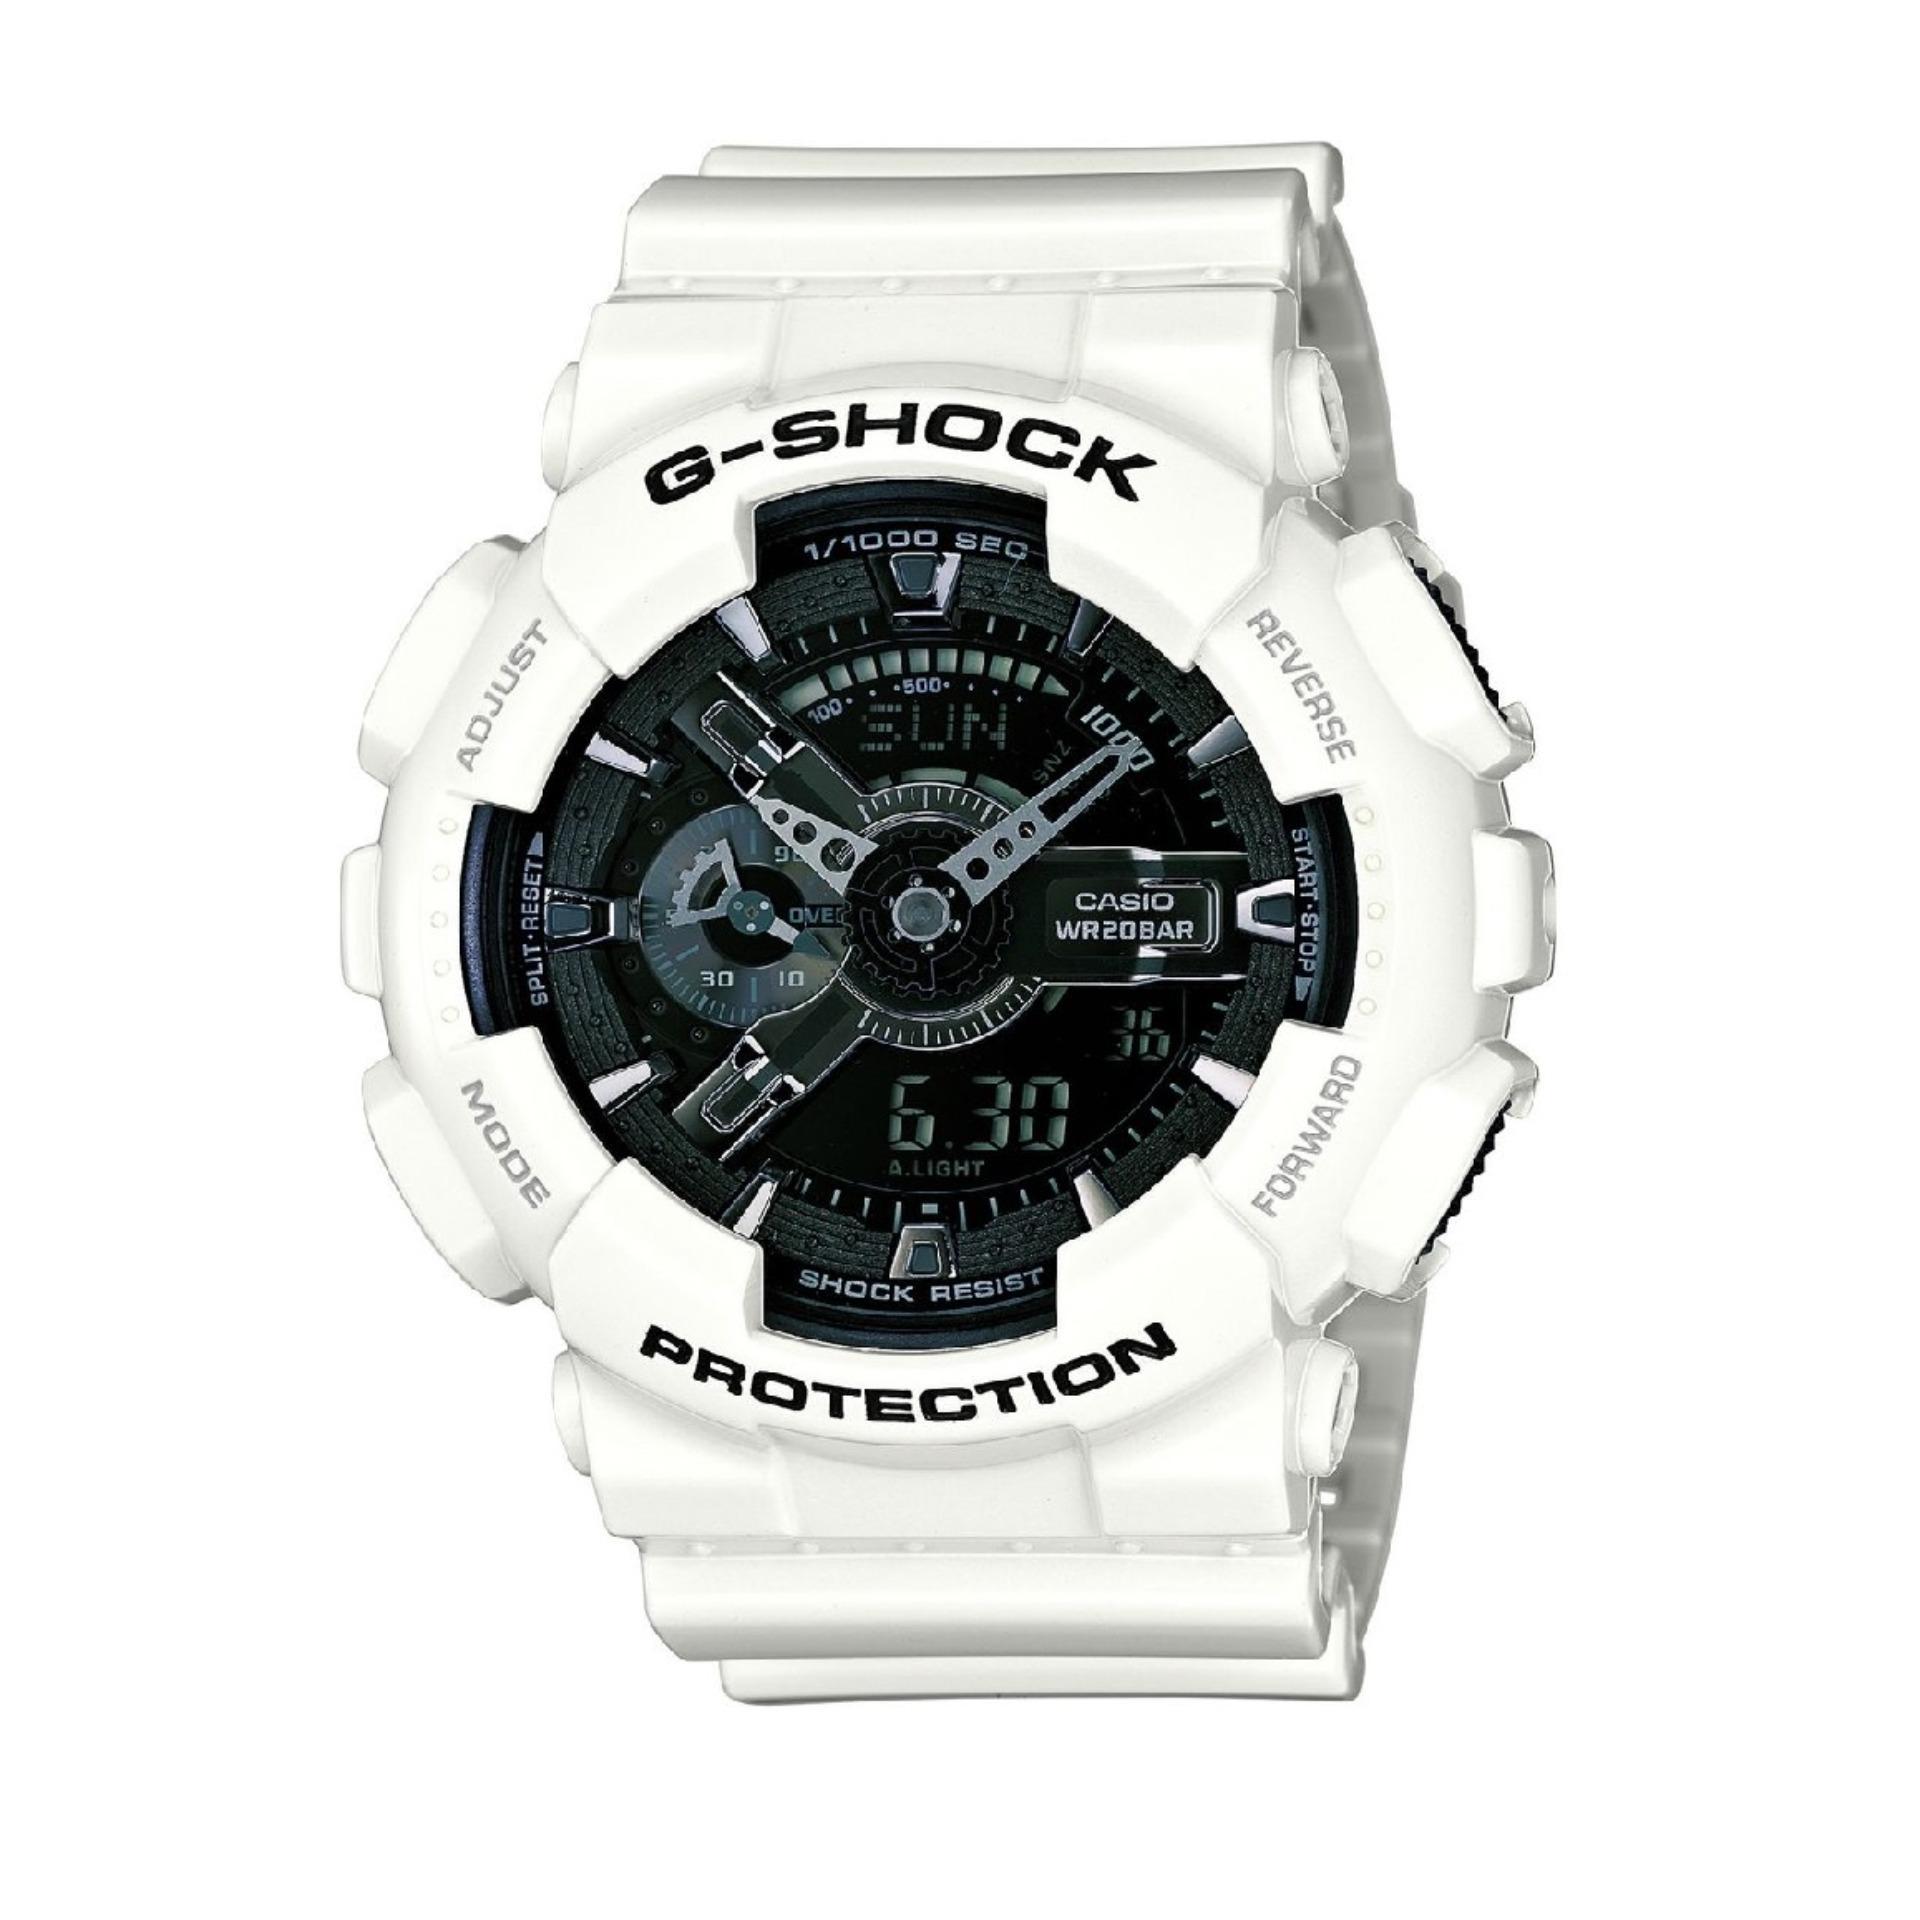 Jam Tangan Casio G Shock Original Pria Gd 350 1b Ga 110gwg 7adr Sport Watch